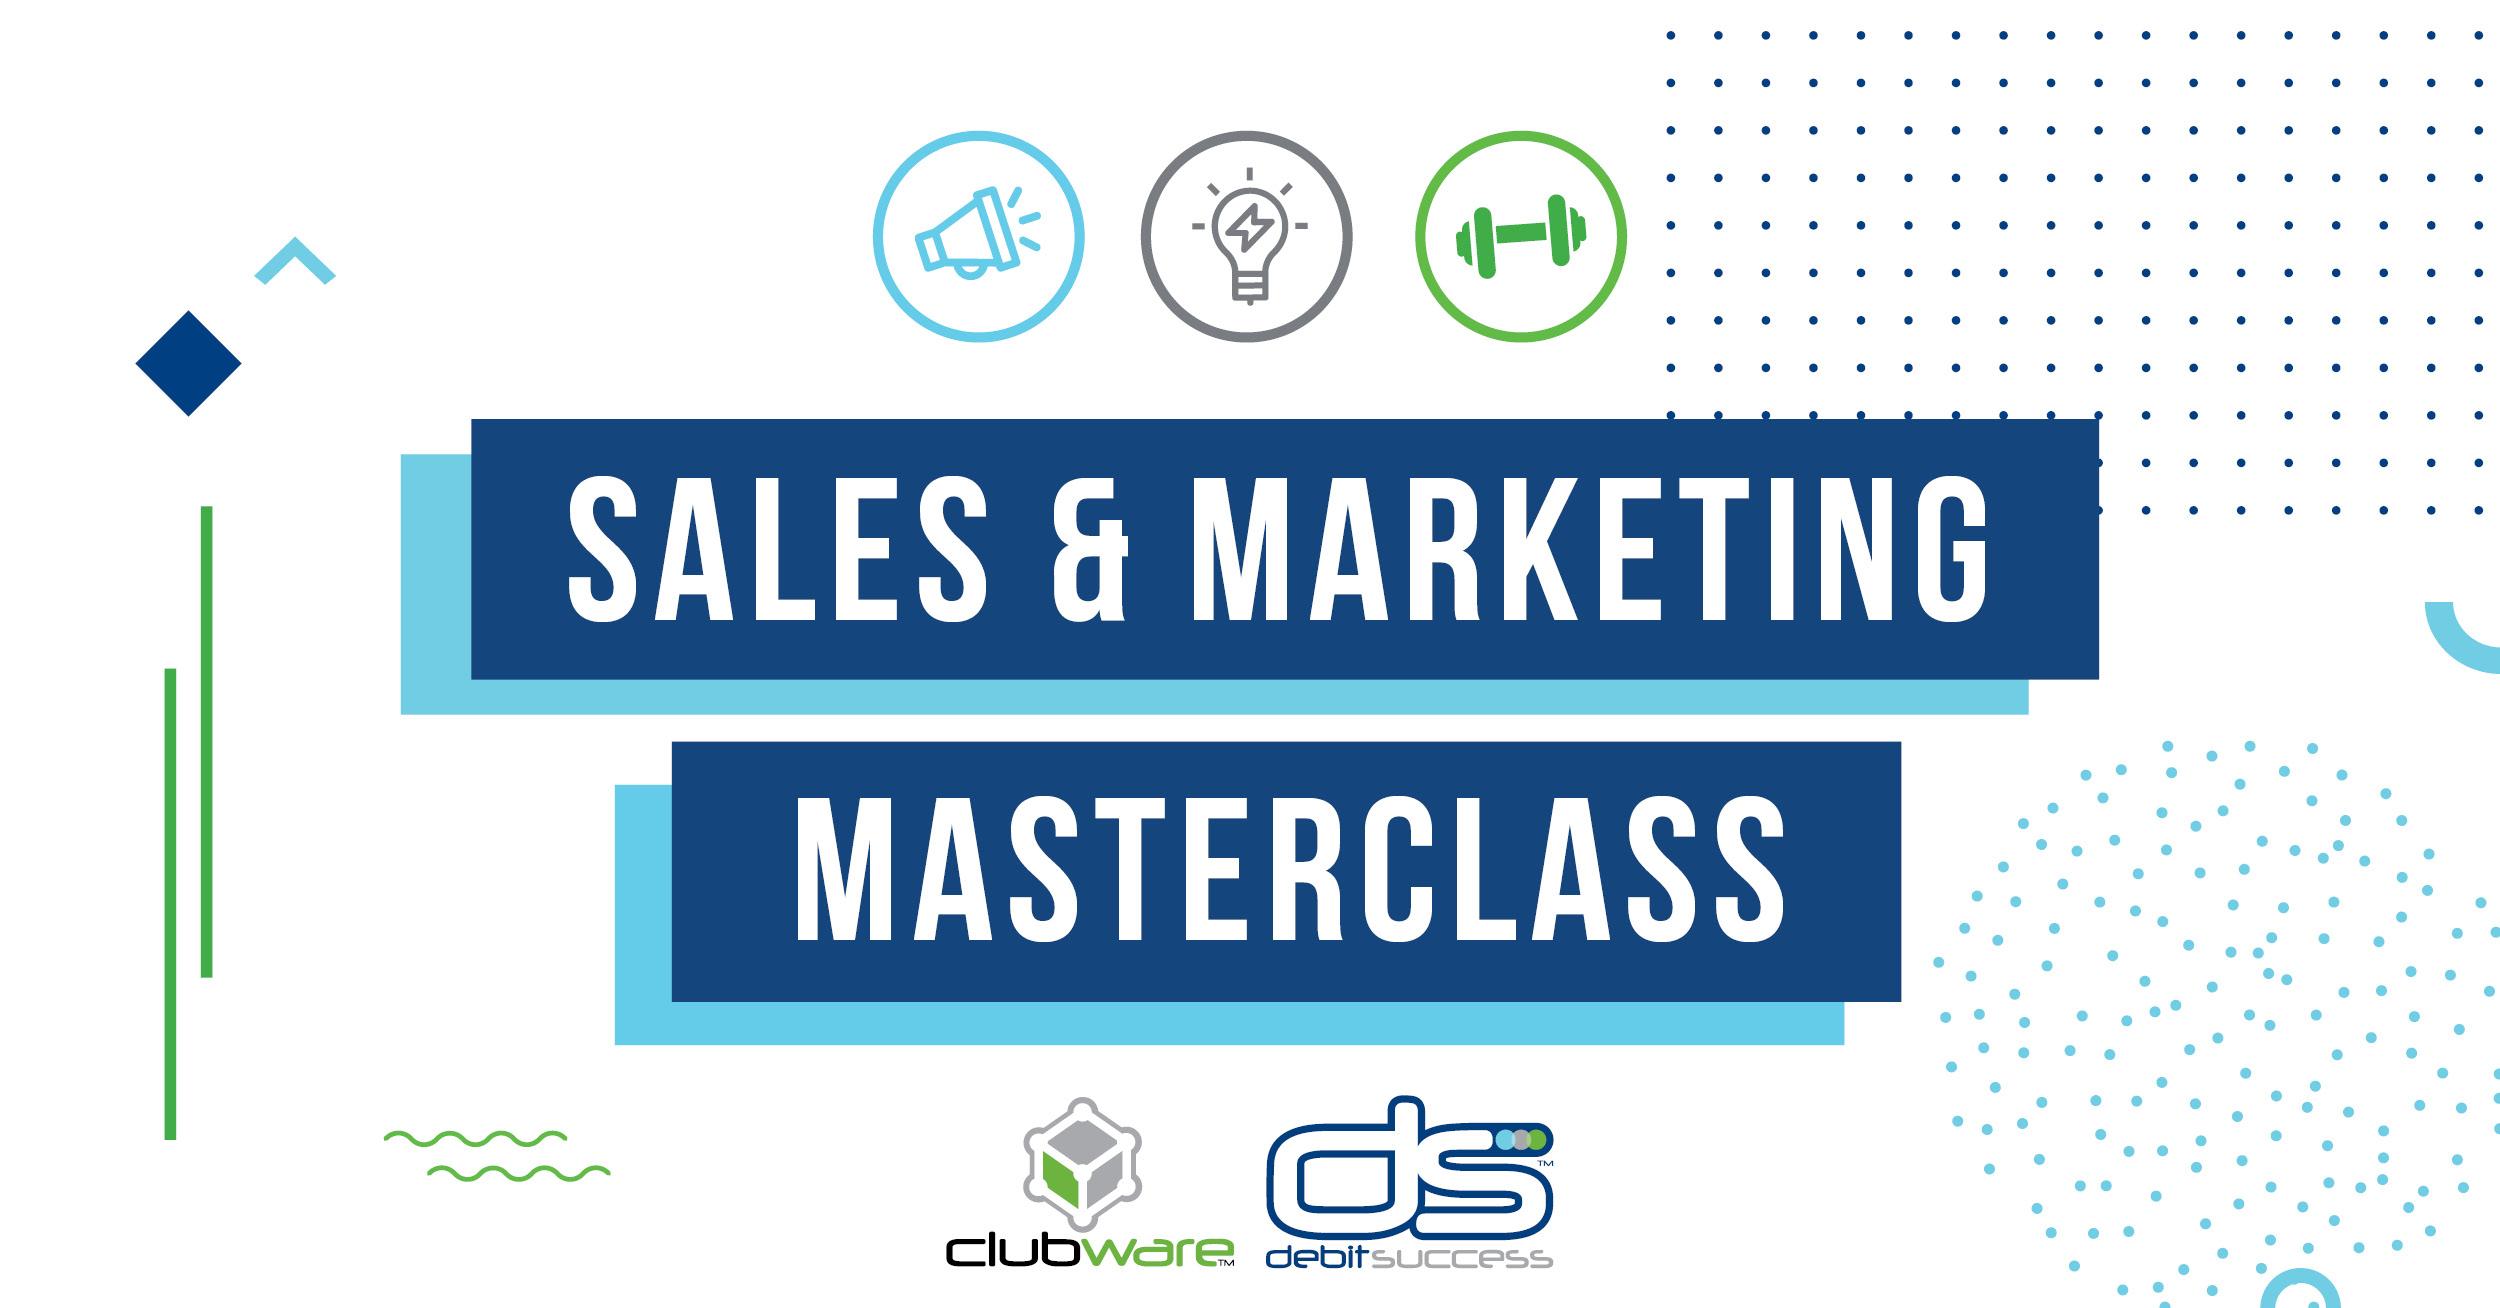 sales and marketing masterclass